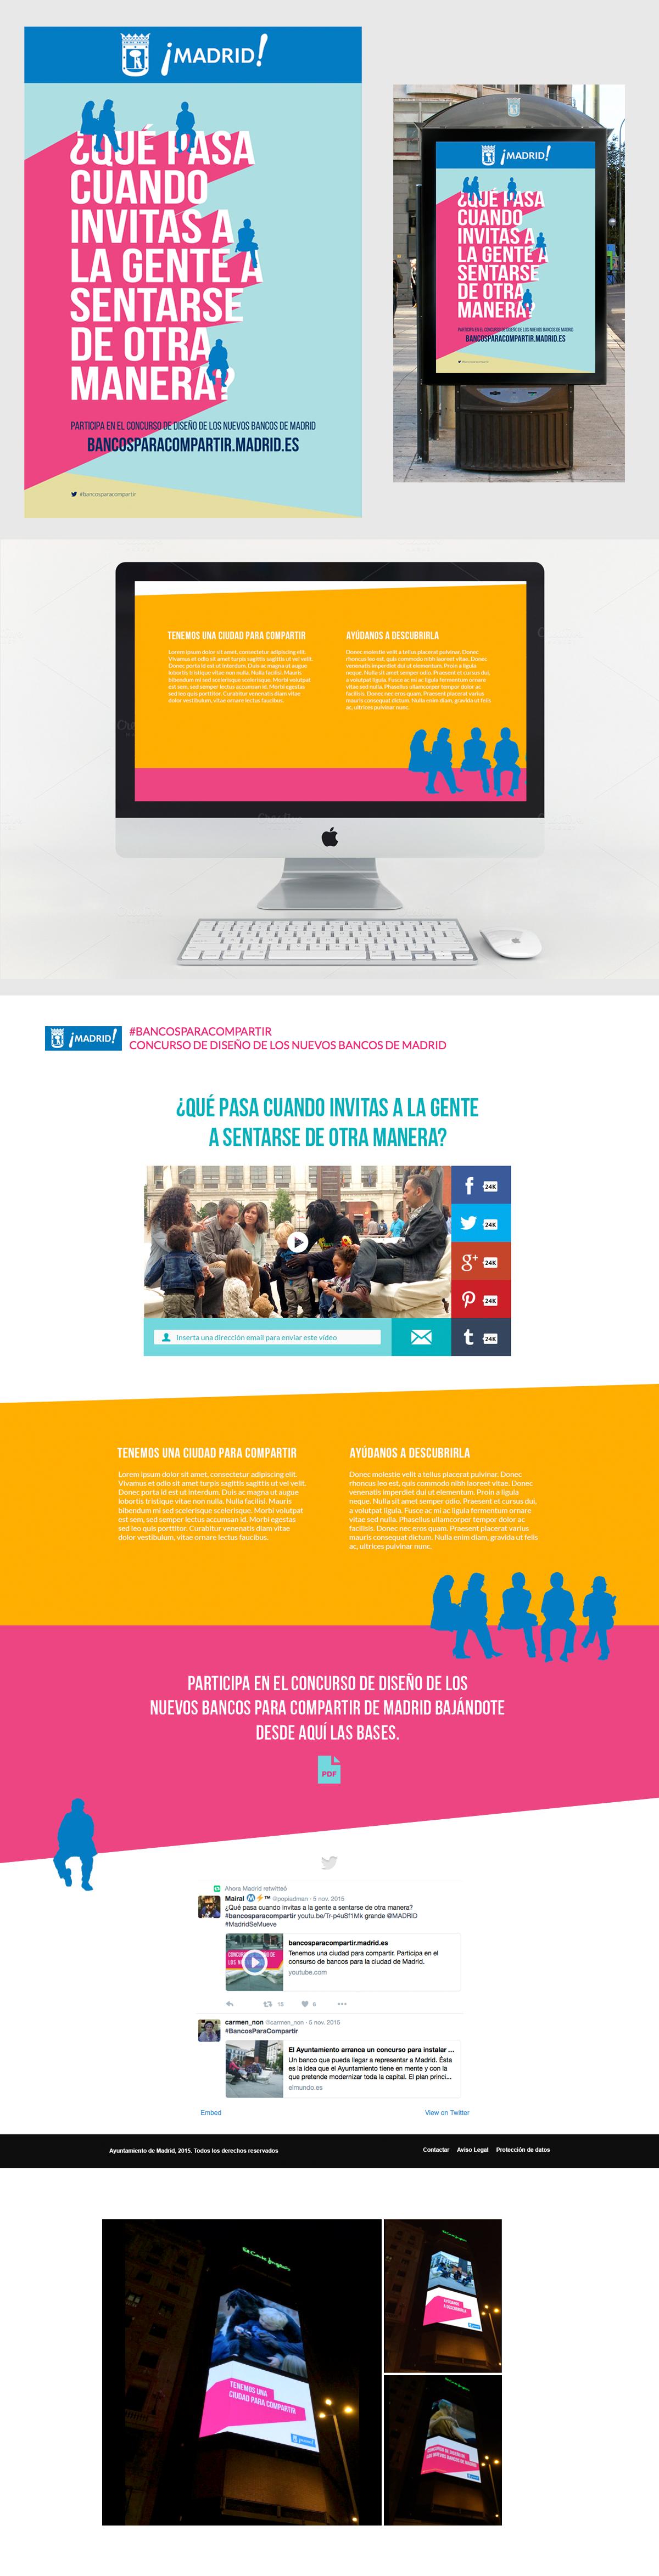 institucional publicidadexterior bancosparacompartir ayuntamientomadrid